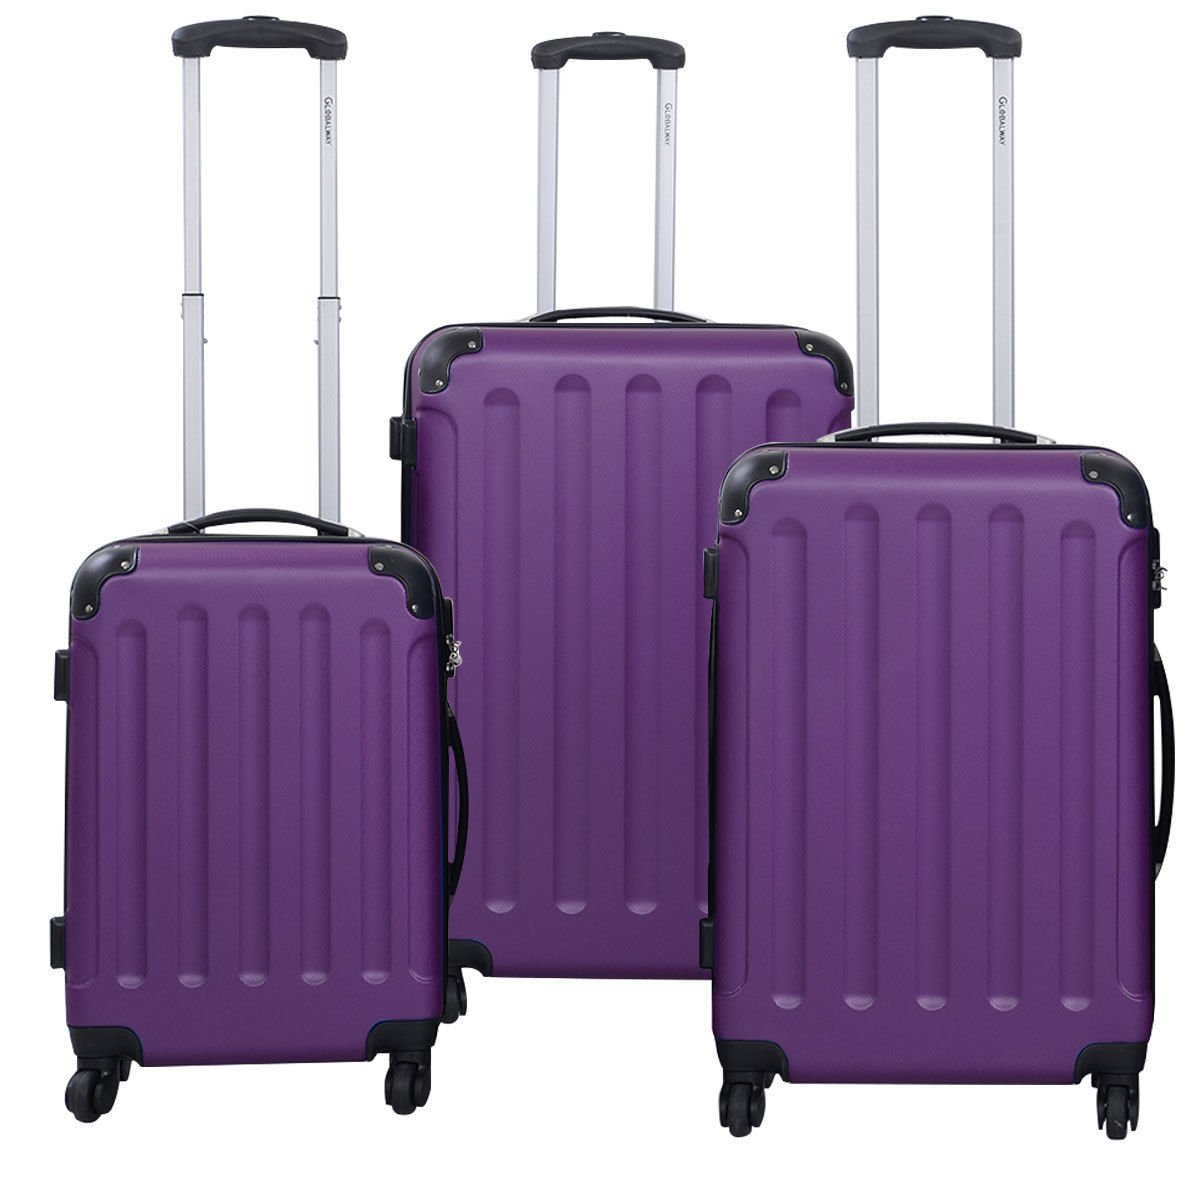 3 Pcs Luggage Travel Set Bag ABS+PC Trolley Suitcase Purple